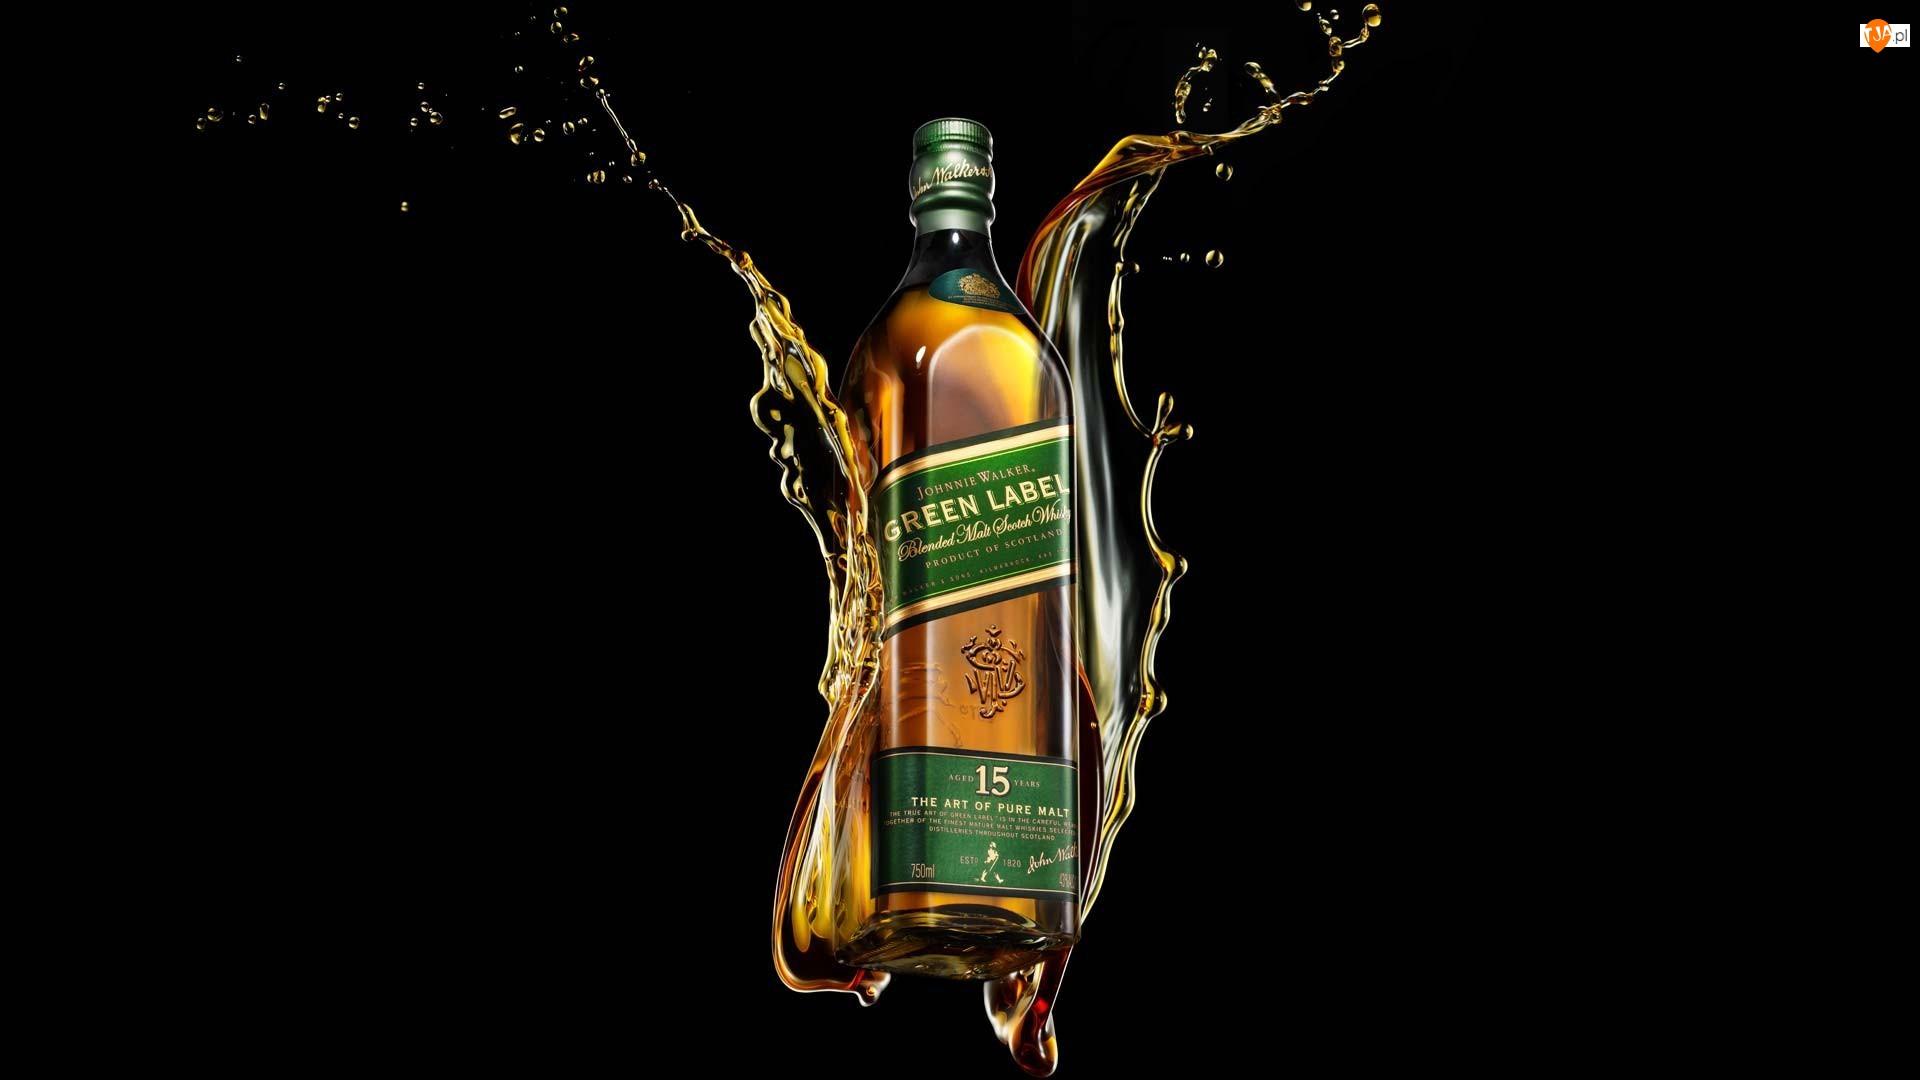 Whisky Johnnie Walker Green Label, Czarne tło